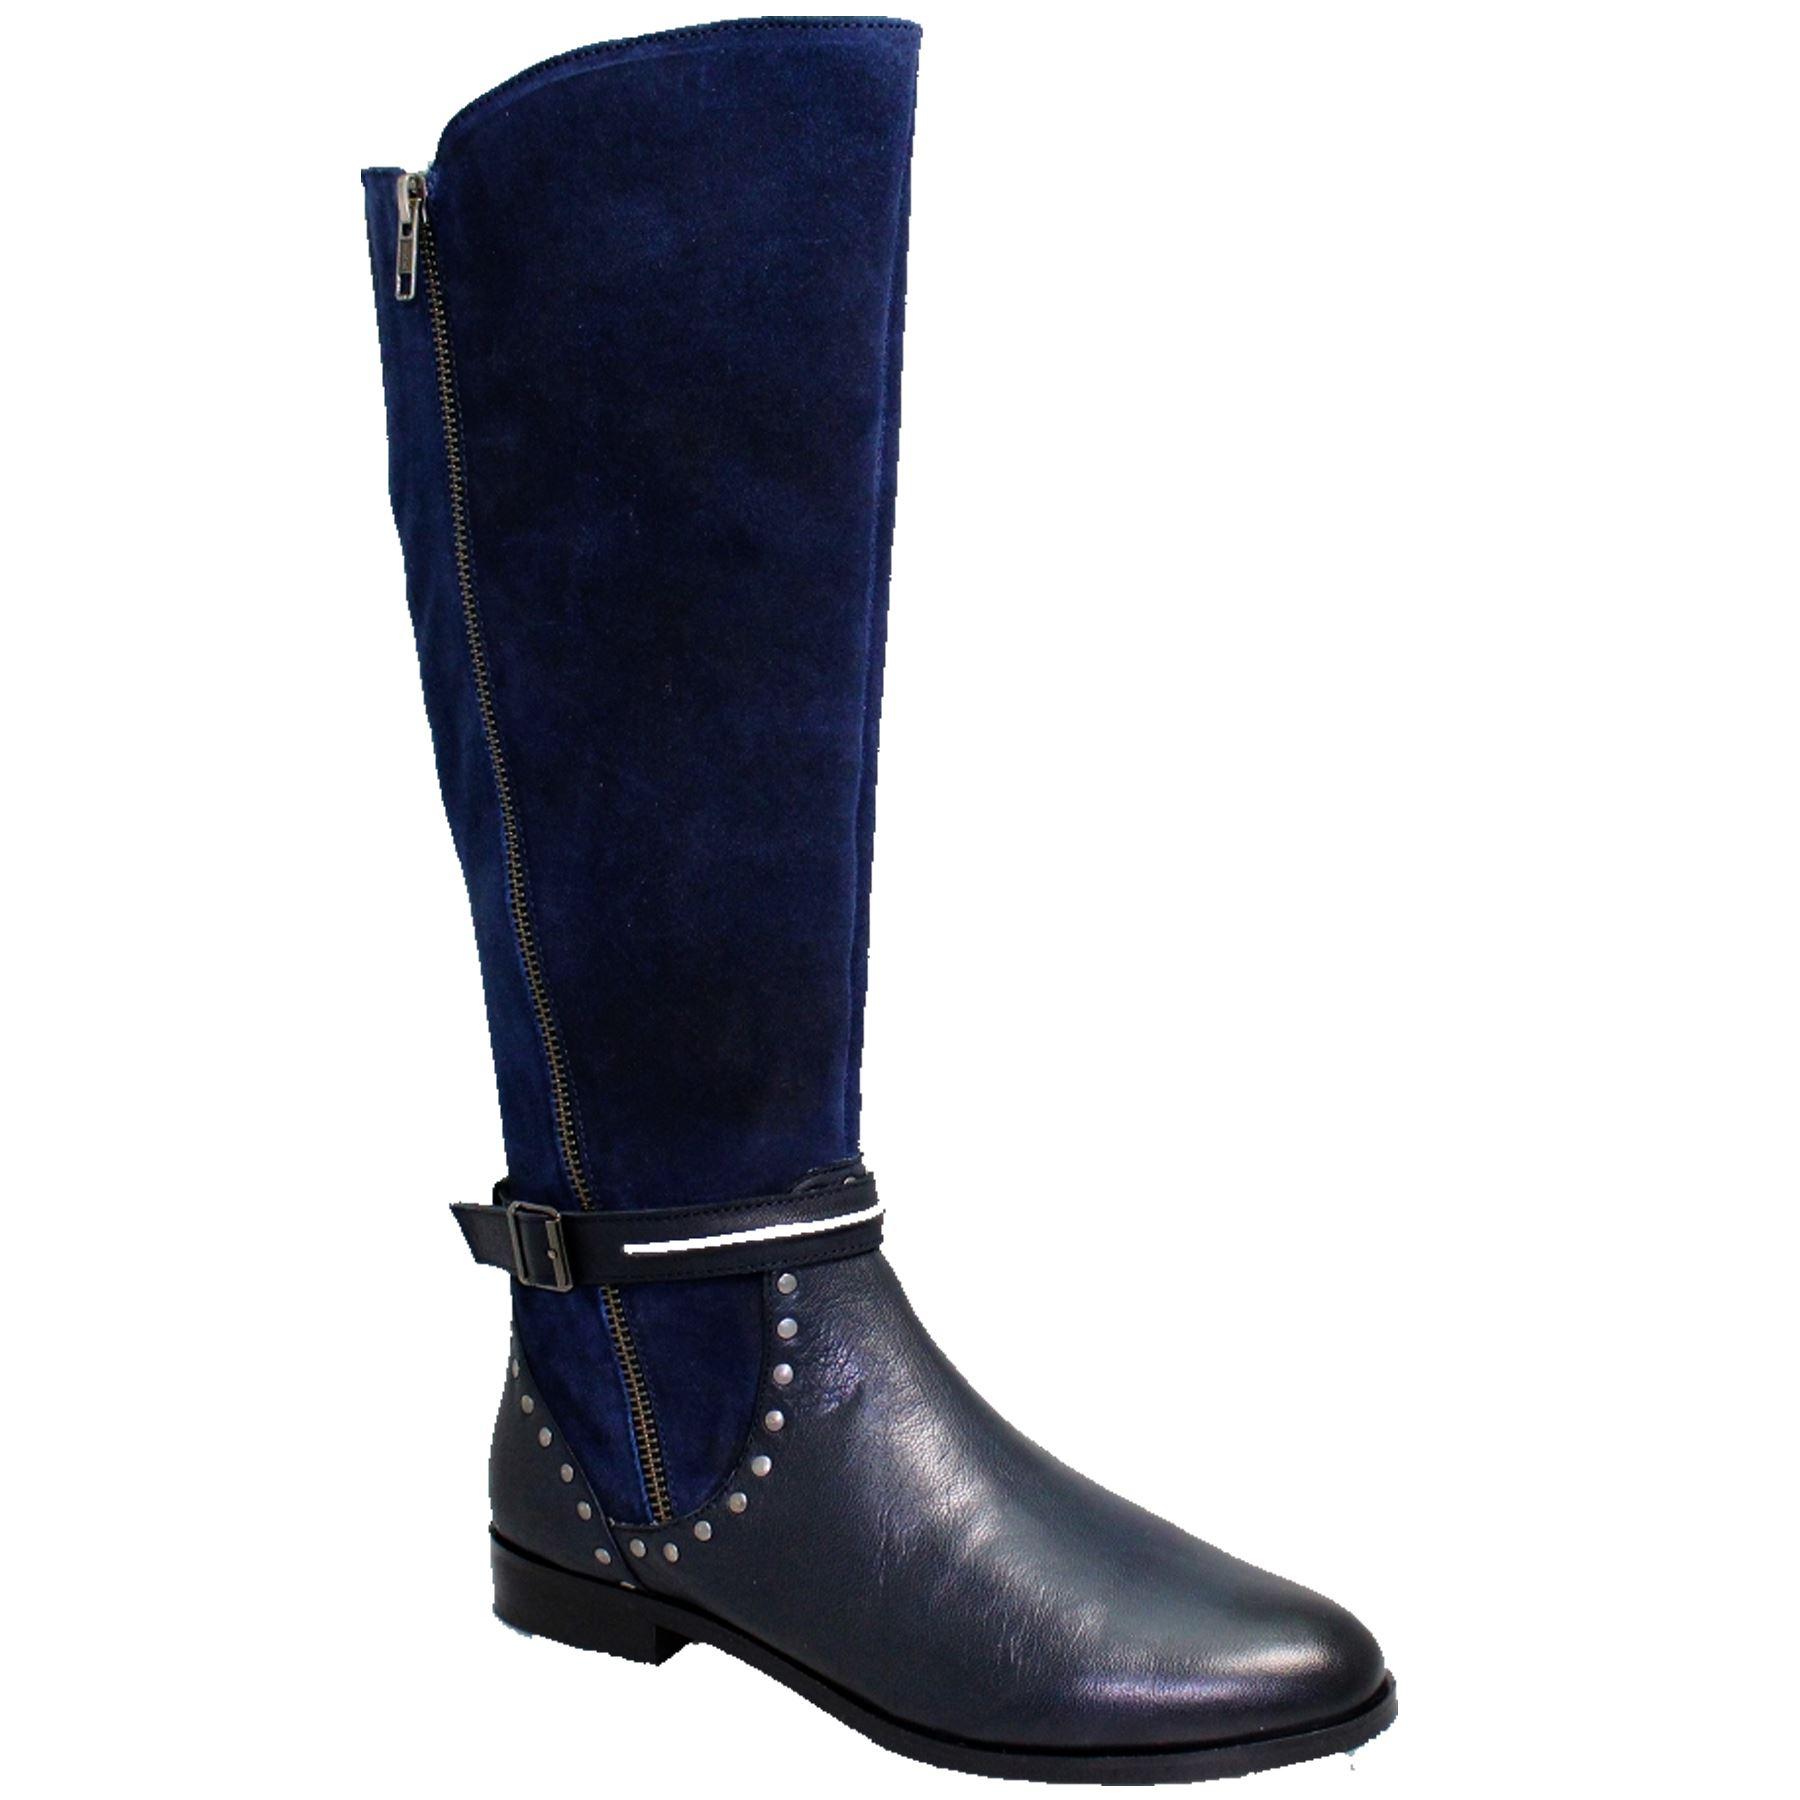 GLH528 Andros Side Side Side Zip Real Leder Padded Insole Niedrig Heel Stud Long Stiefel 8cbb21